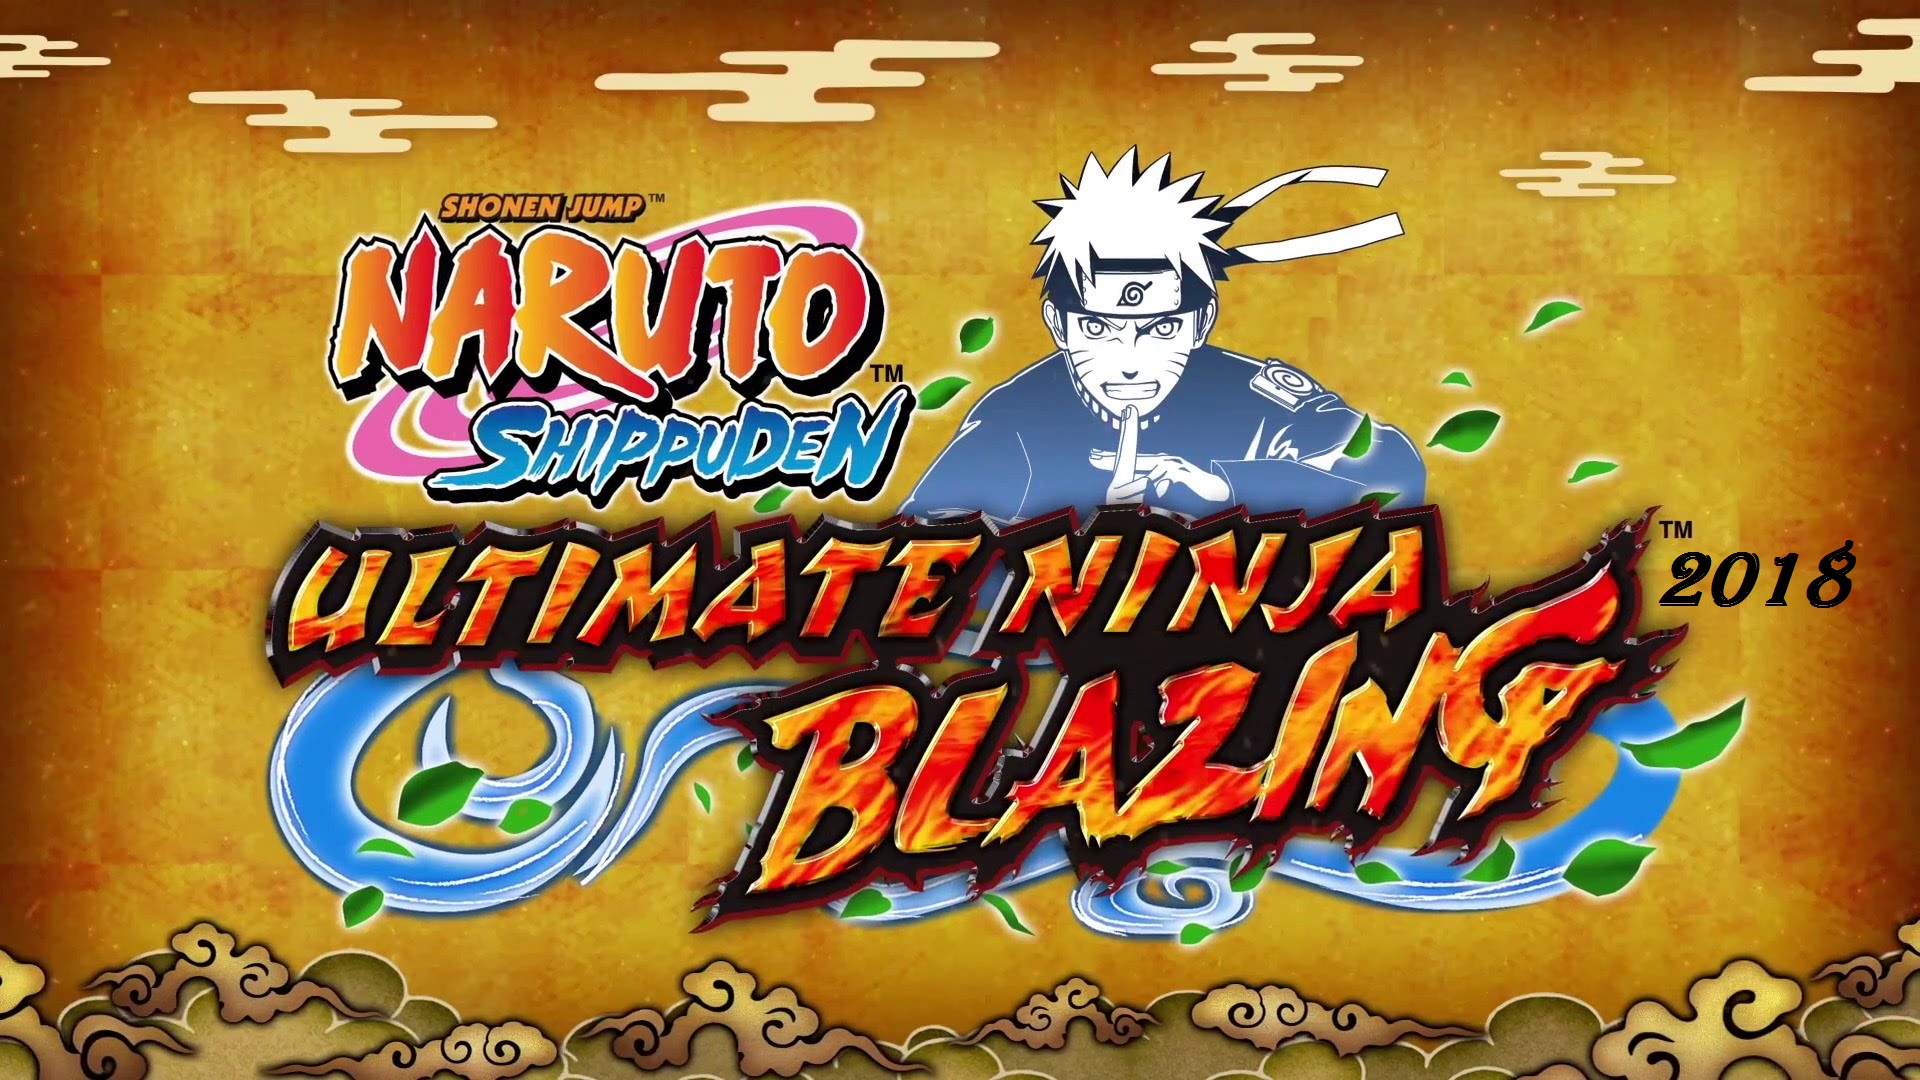 Naruto Shippuden Ultimate Ninja Blazing Mod Apk Download